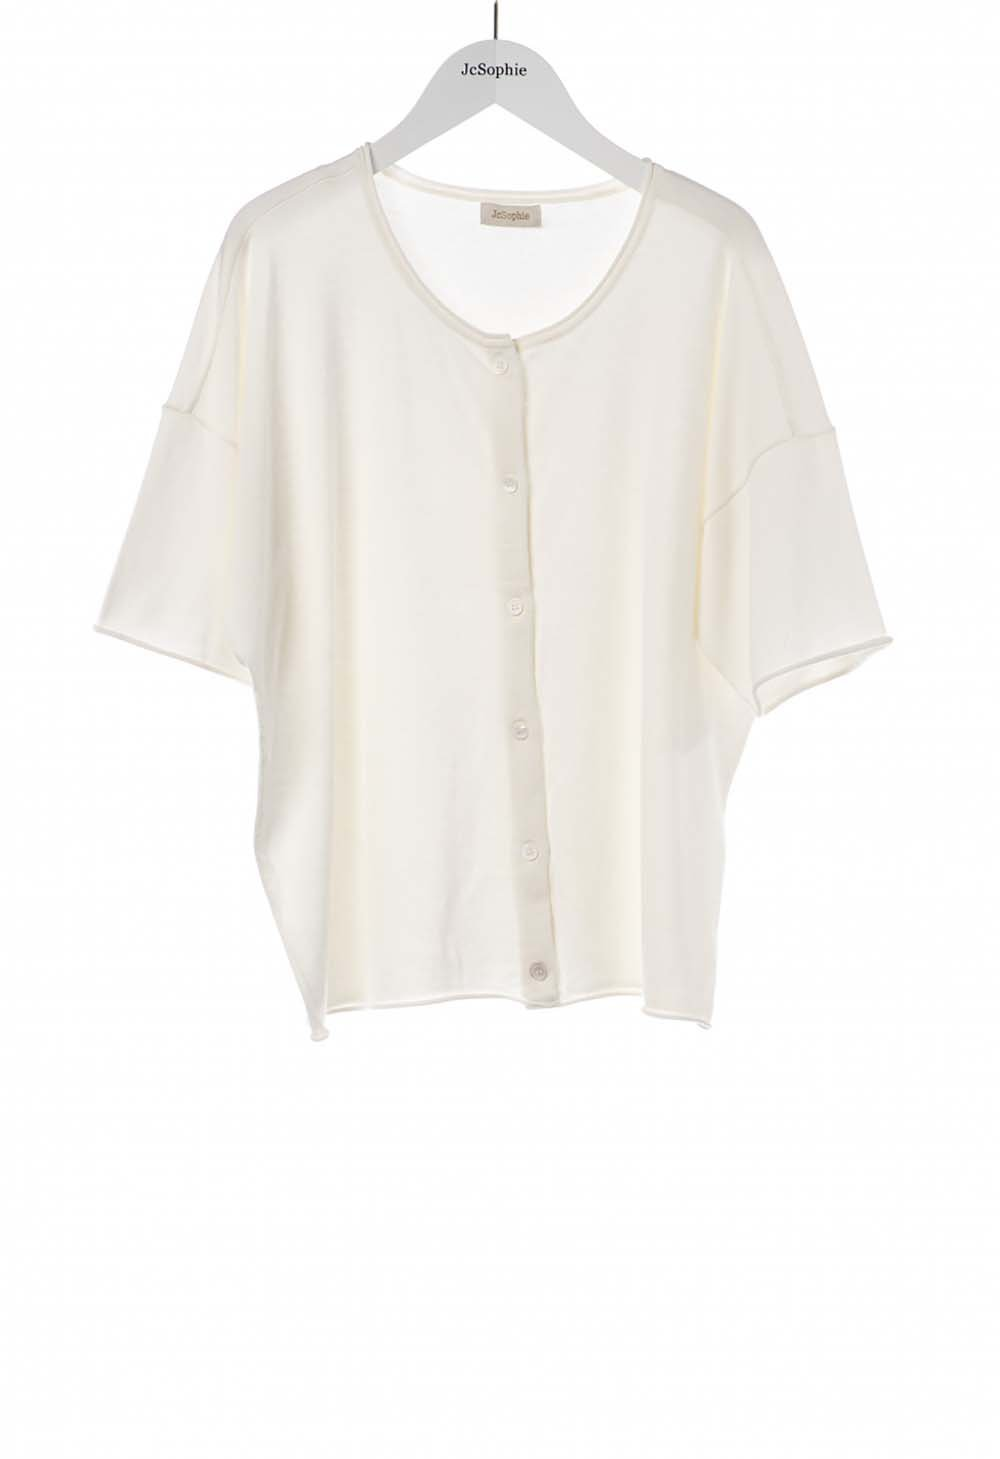 JC SOPHIE Vest Hugette Off White   Artikelnummer:H1074 101